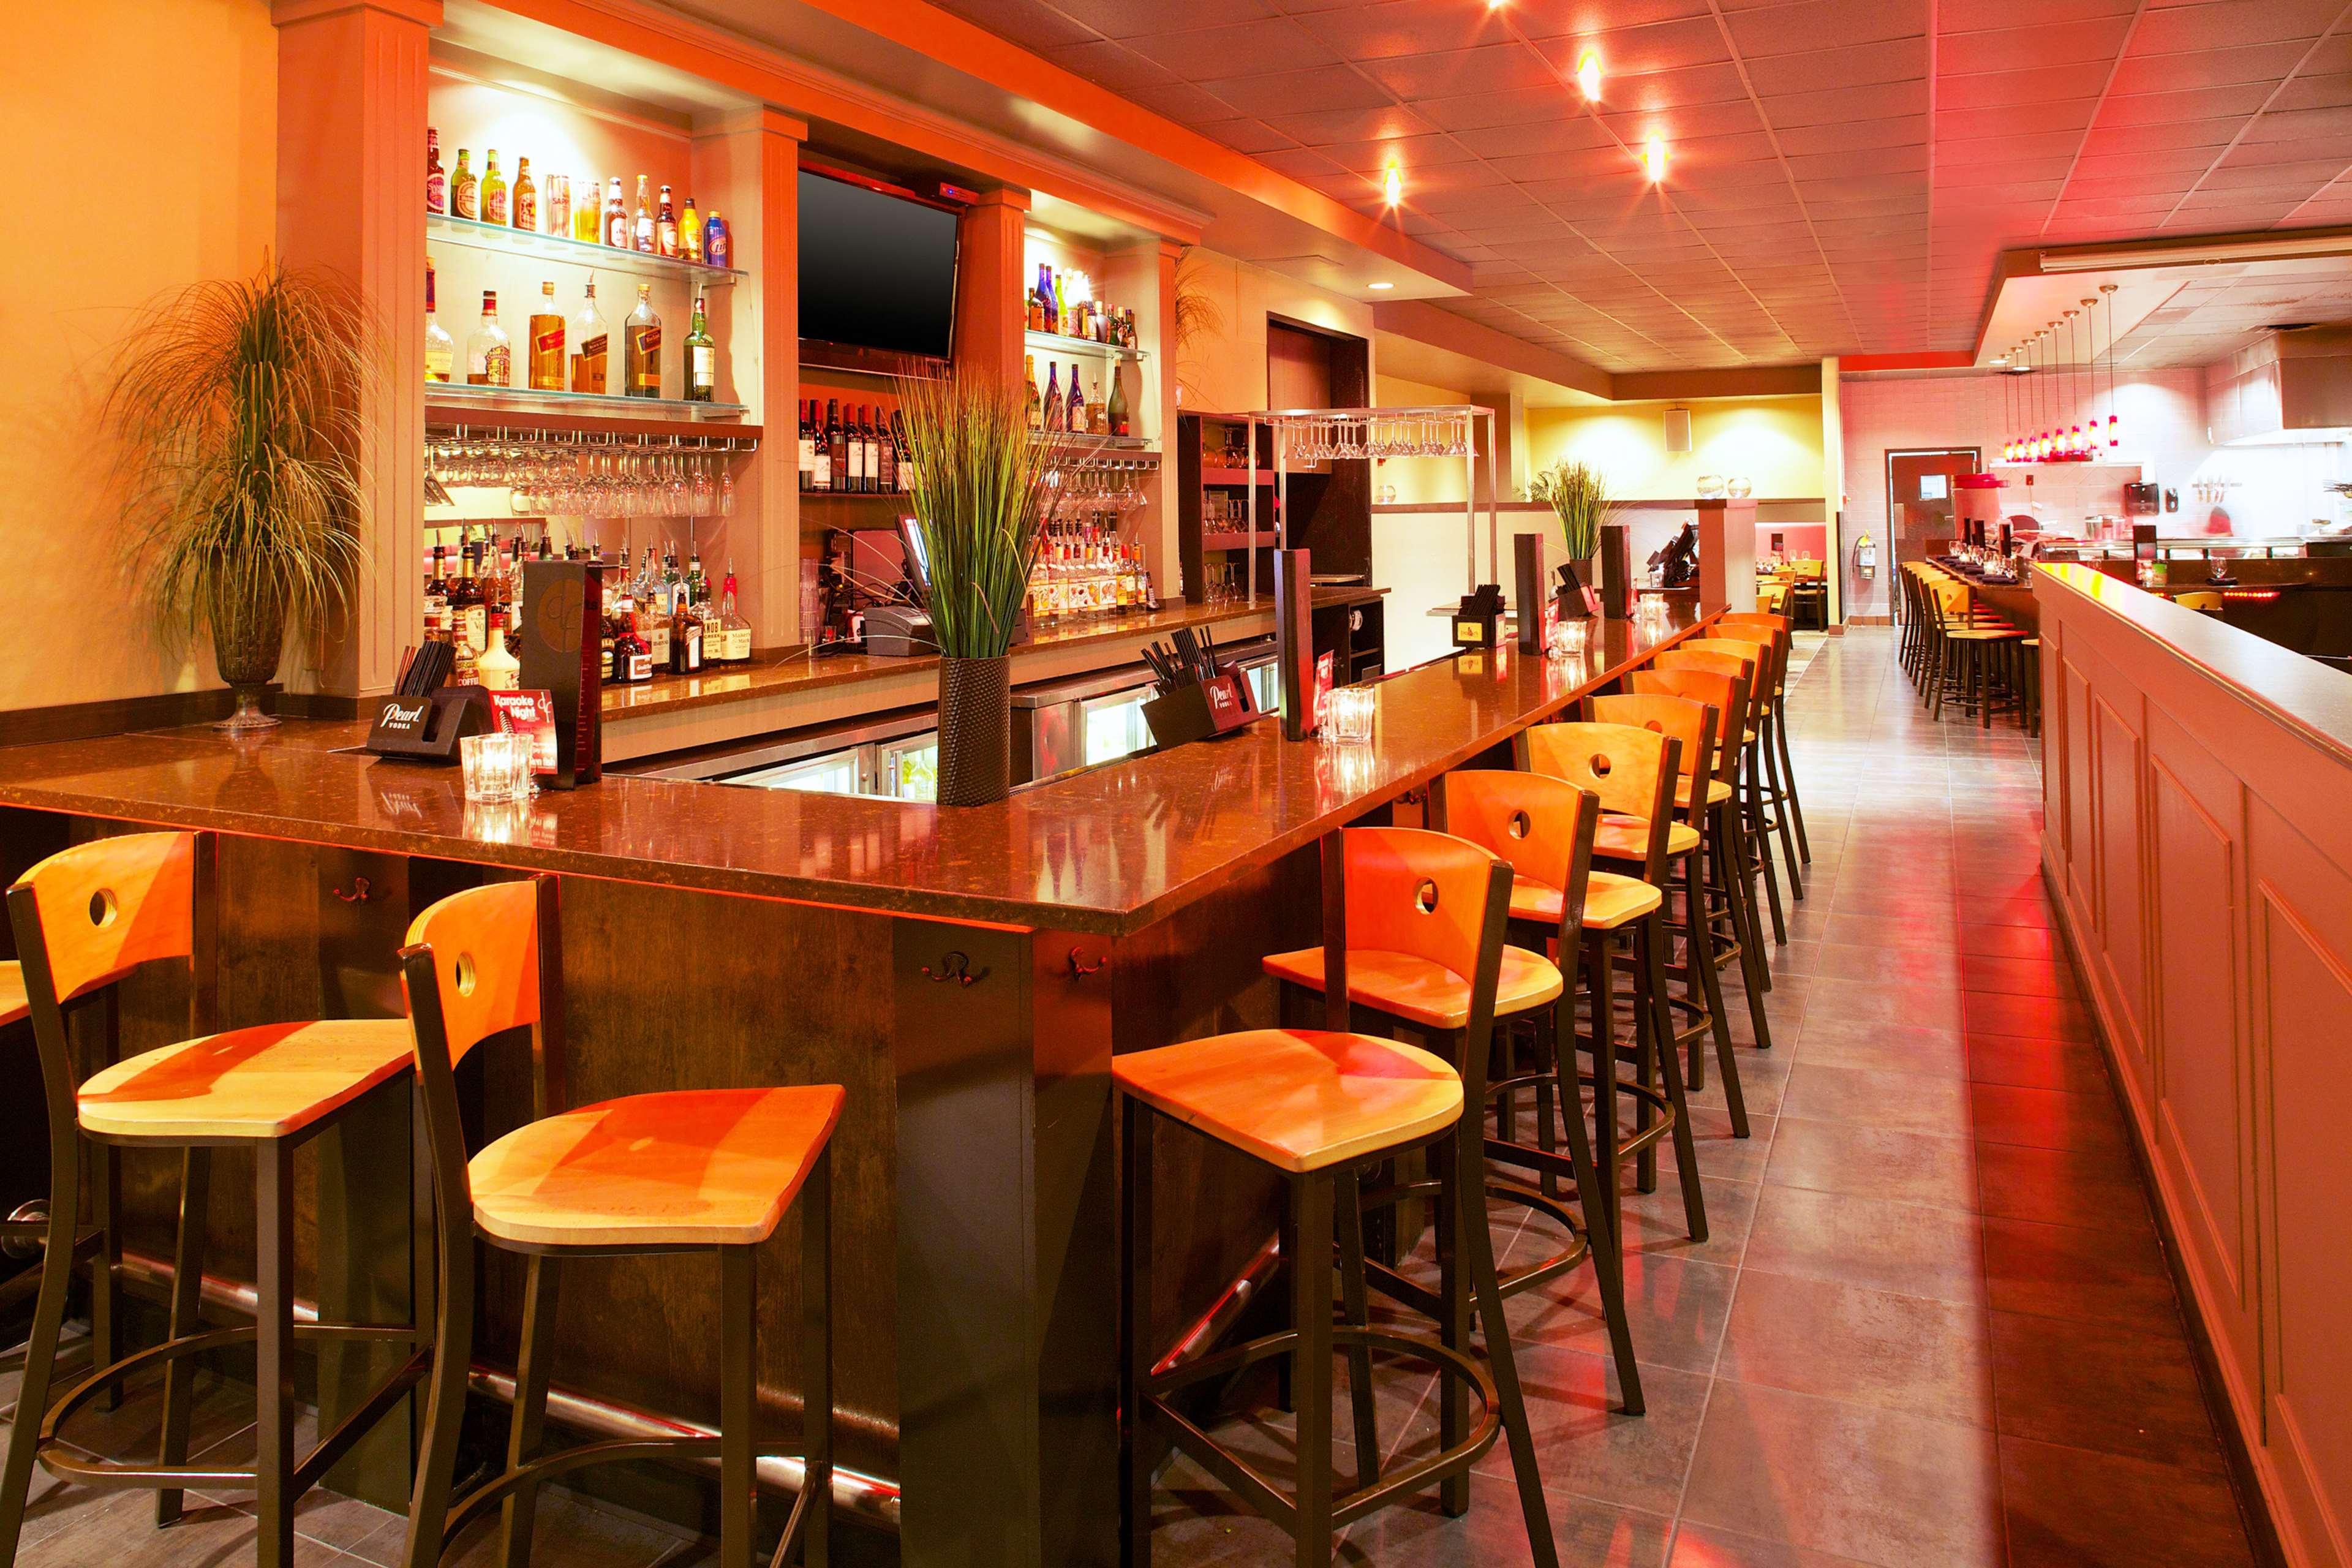 Sheraton Westport Plaza Hotel St. Louis image 4